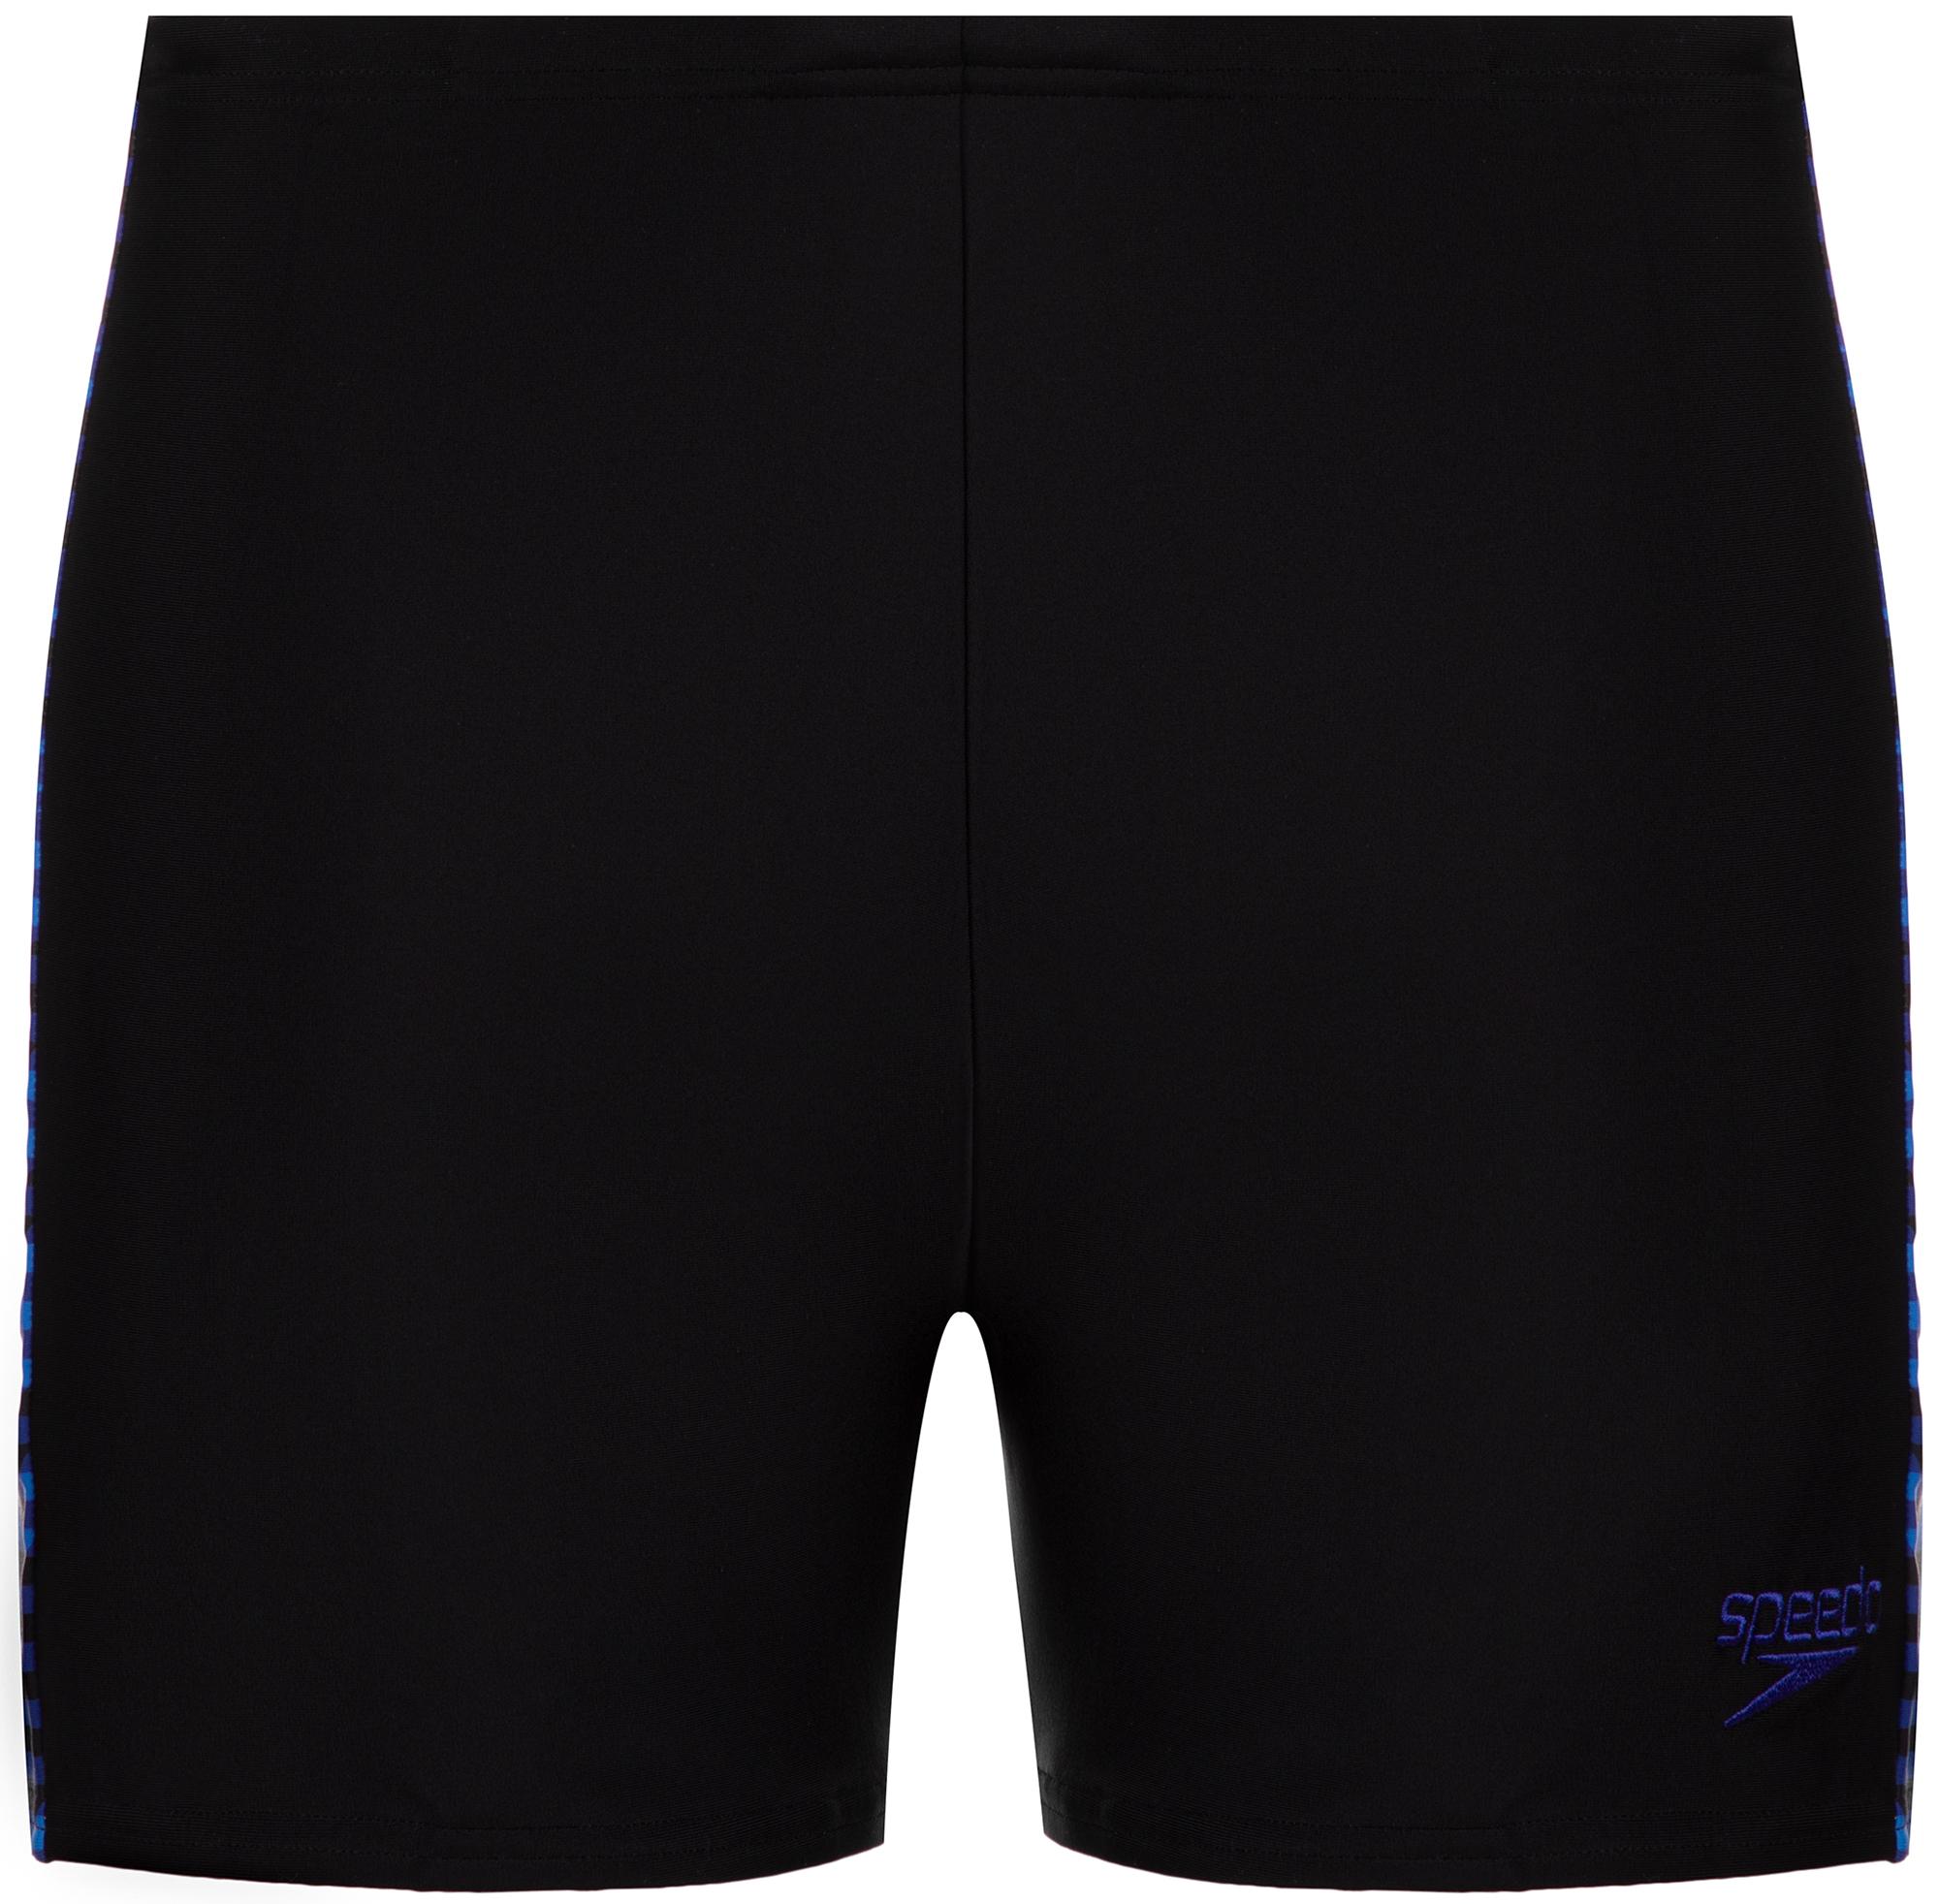 Speedo Плавки-шорты мужские Speedo Allover Panel, размер 46-48 speedo плавки шорты мужские speedo tech logo размер 48 50